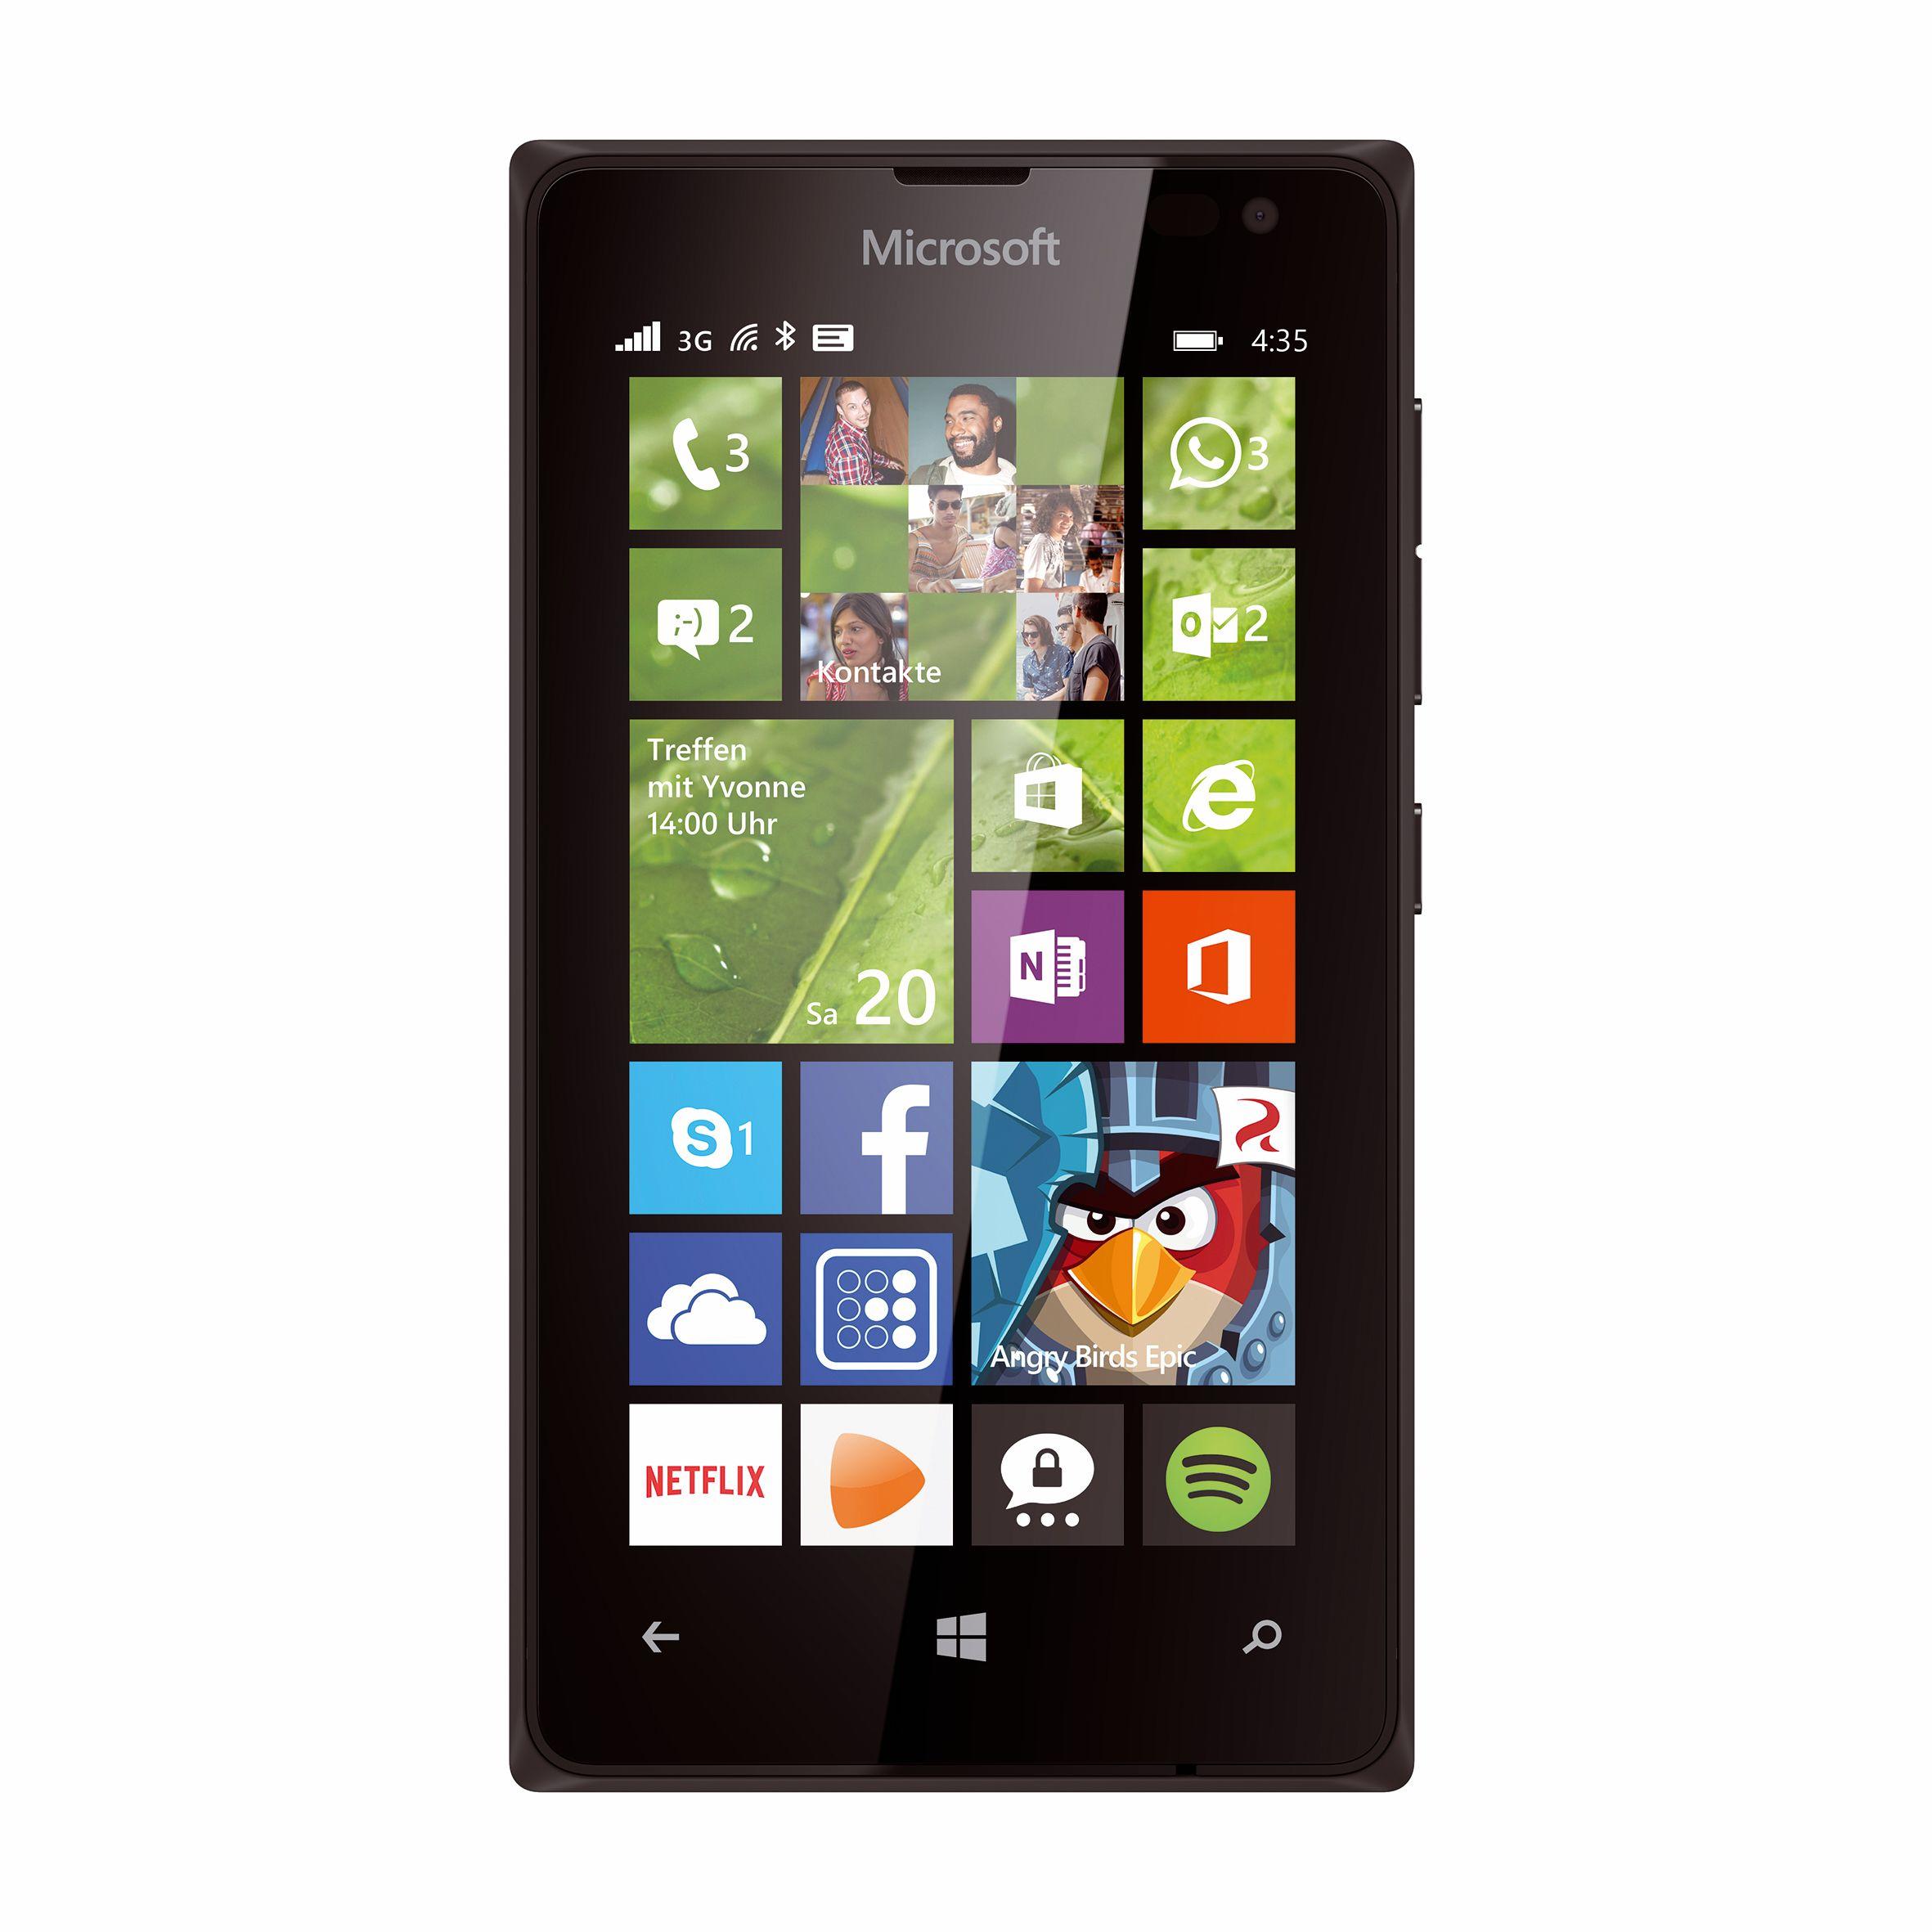 Lumia 435 und Lumia 532: Zwei Windows-Phone-Smartphones für unter 100 Euro - Lumia 435 (Bild: Microsoft)